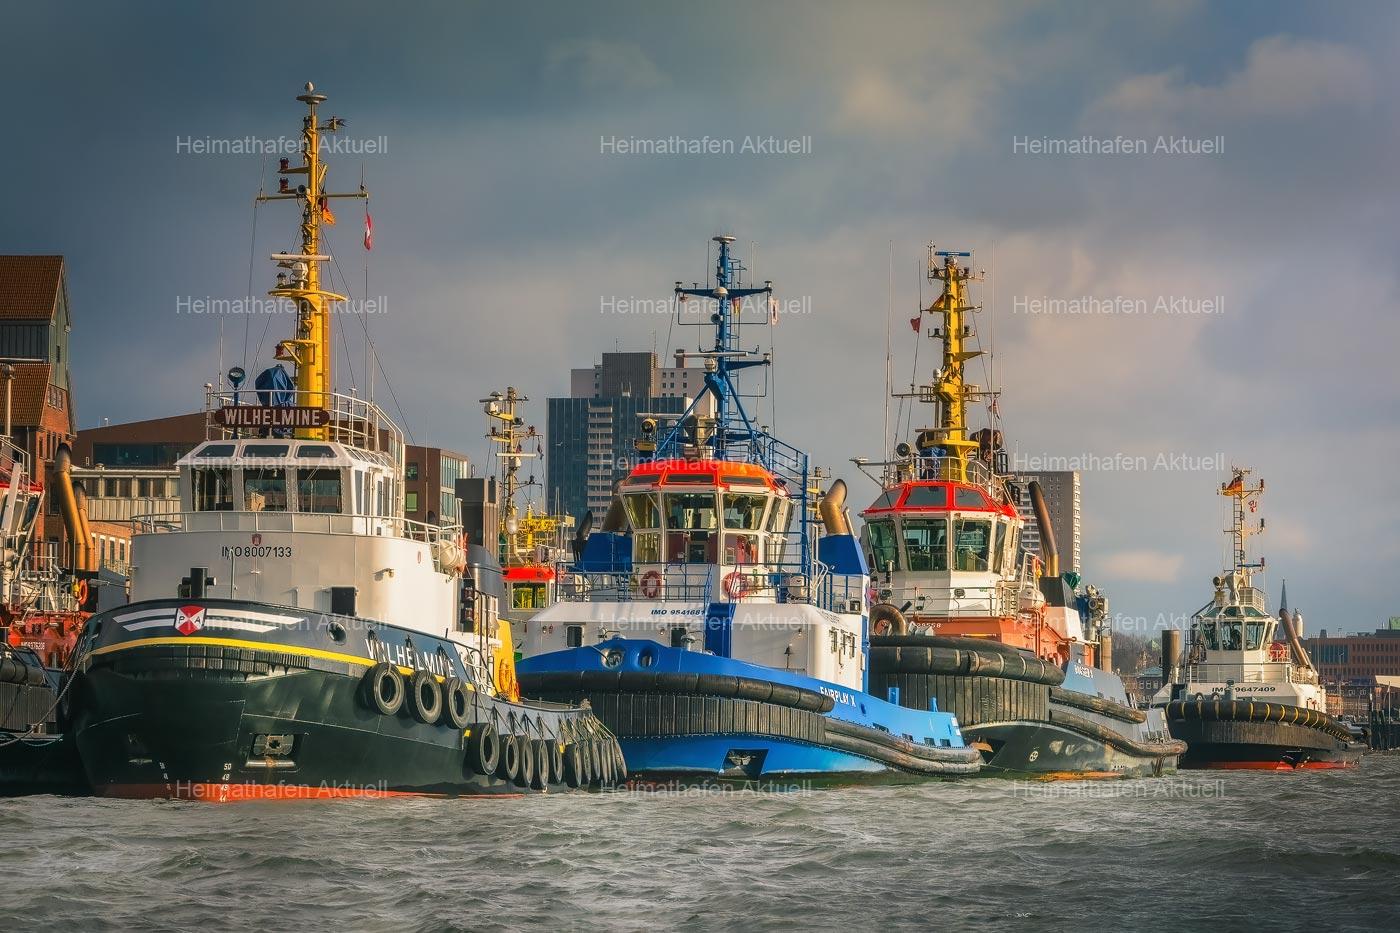 Hamburger Schlepper | Tugboats